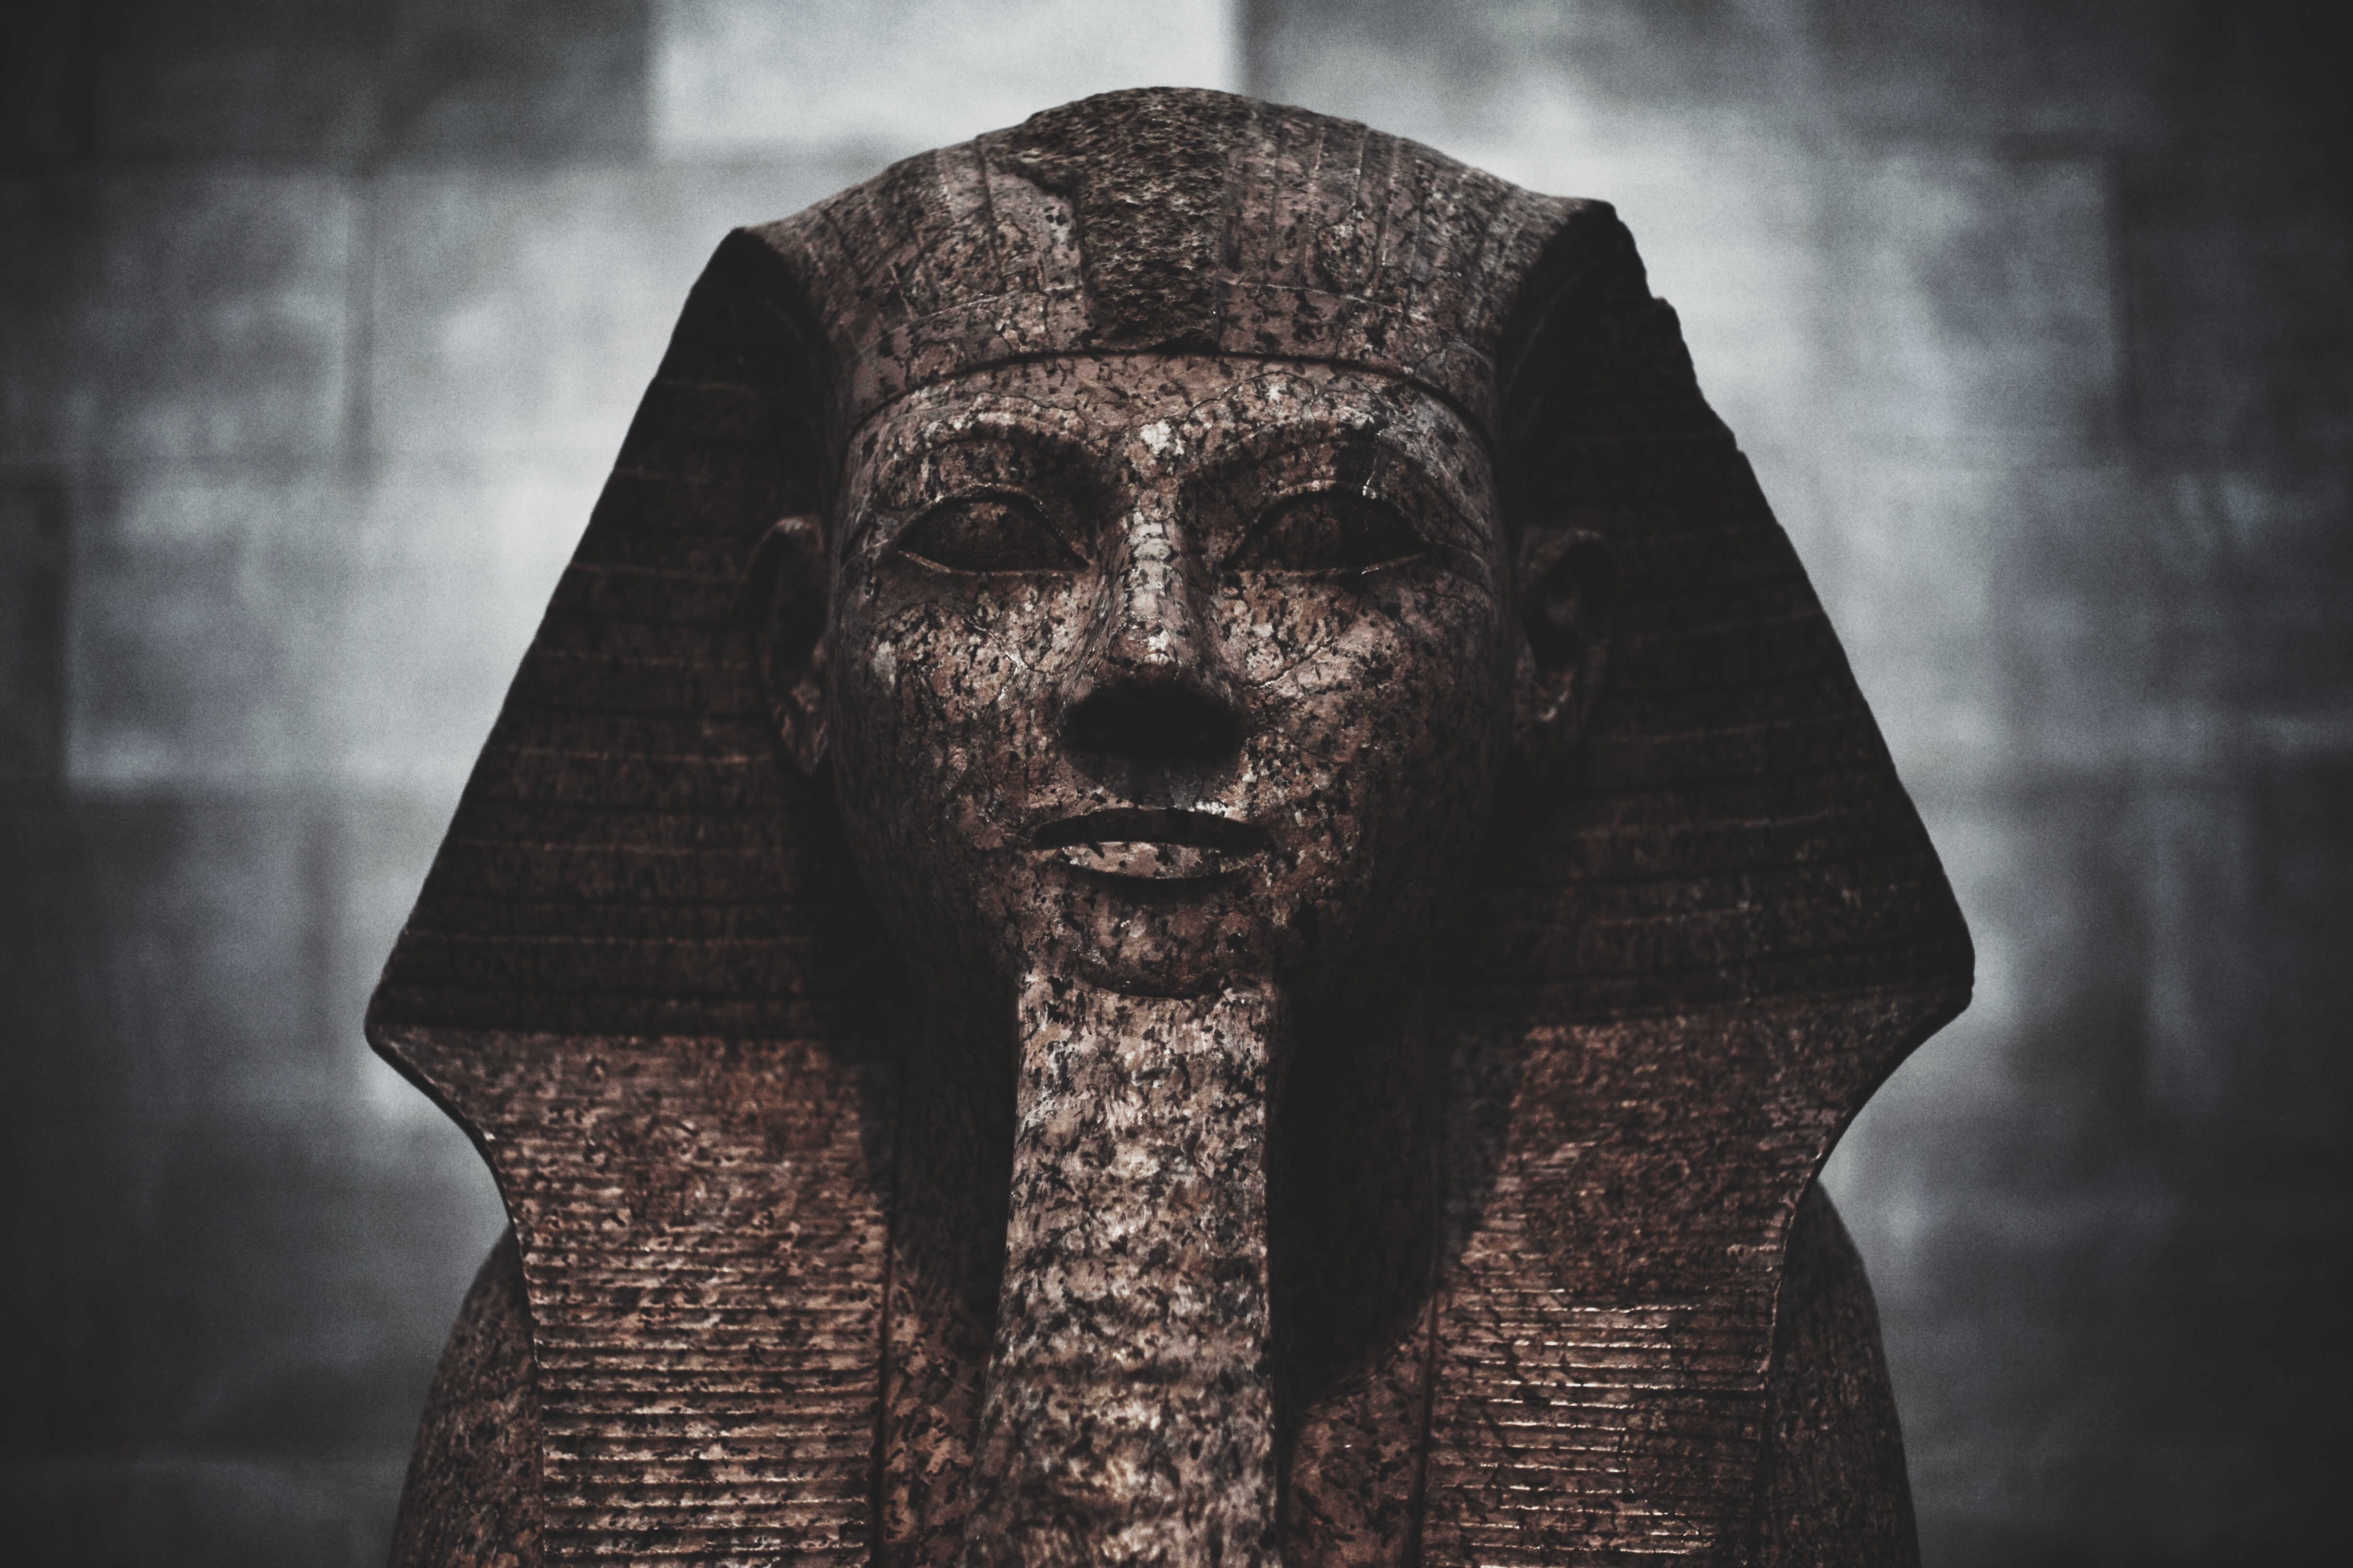 King of Past | Gerardo Morillo | Prosperitylifehacks.com